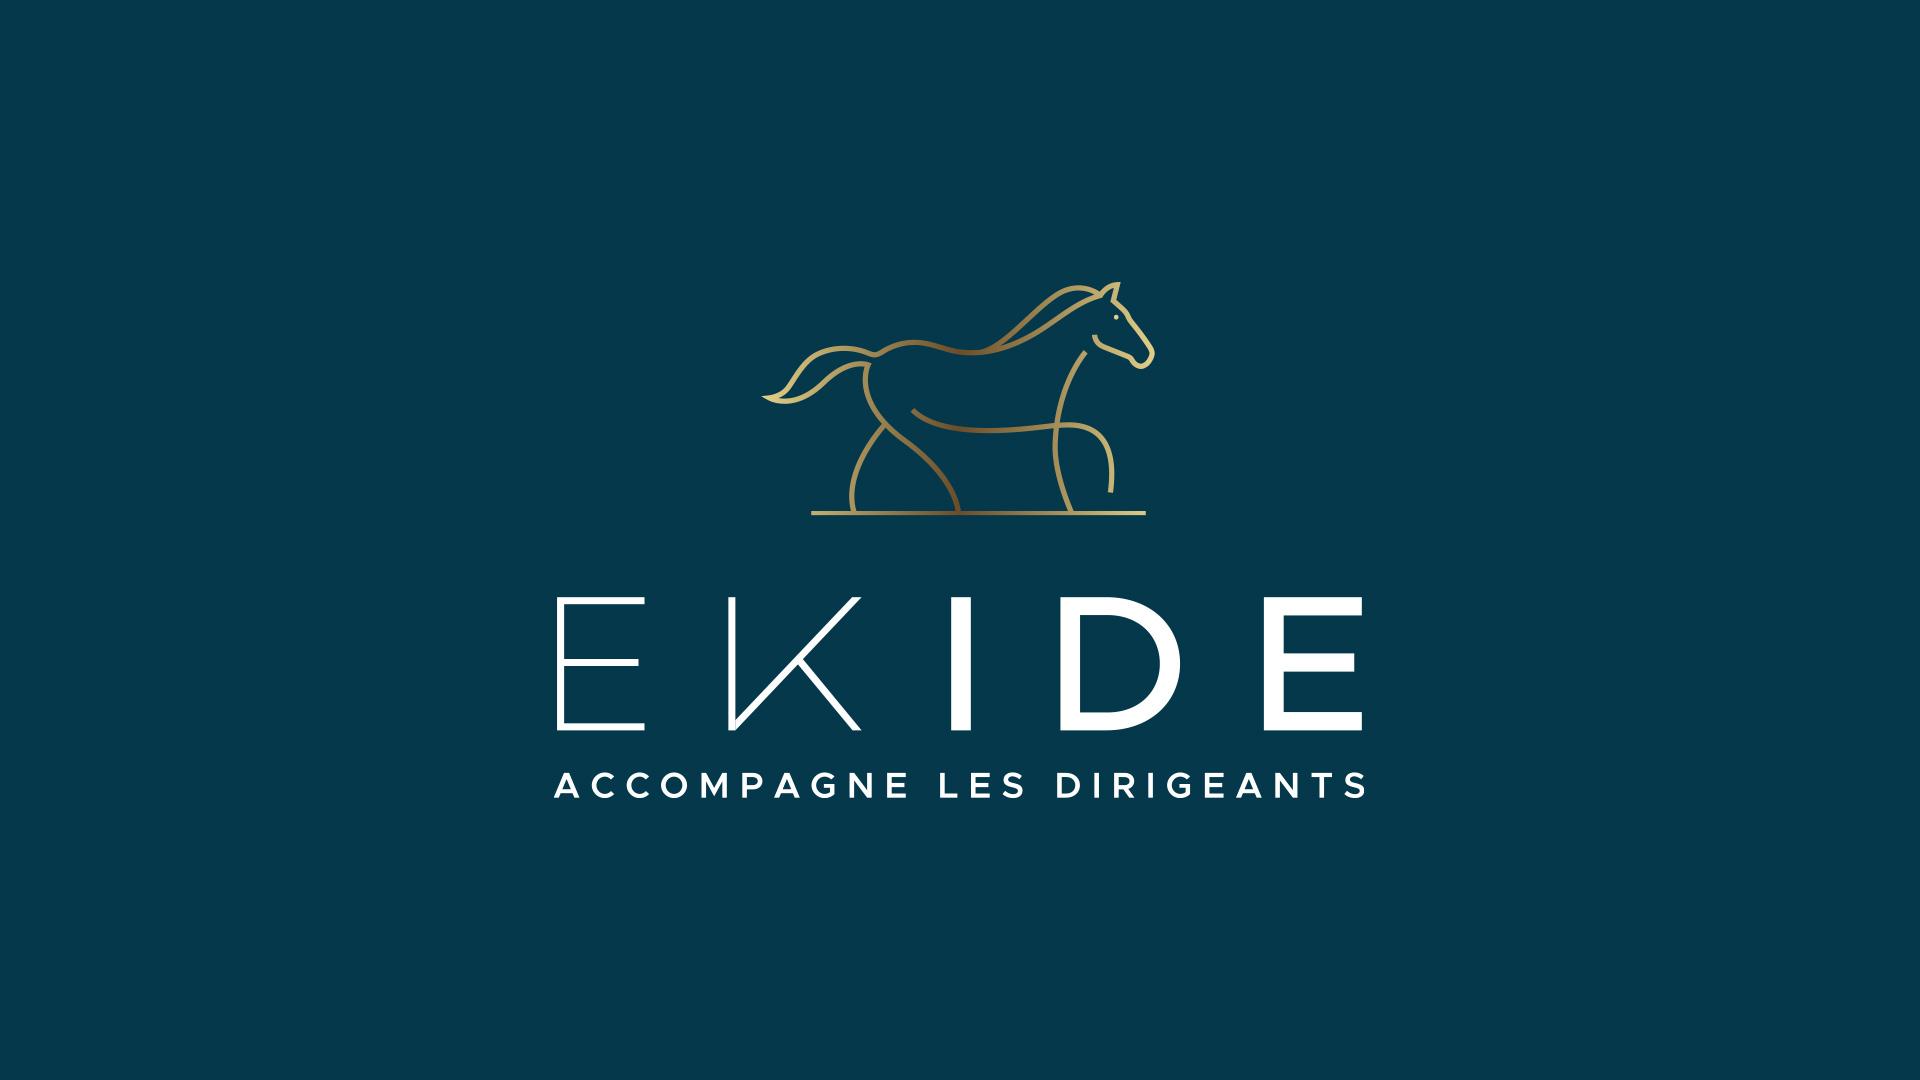 logo EKIDE accompagne les dirigeants